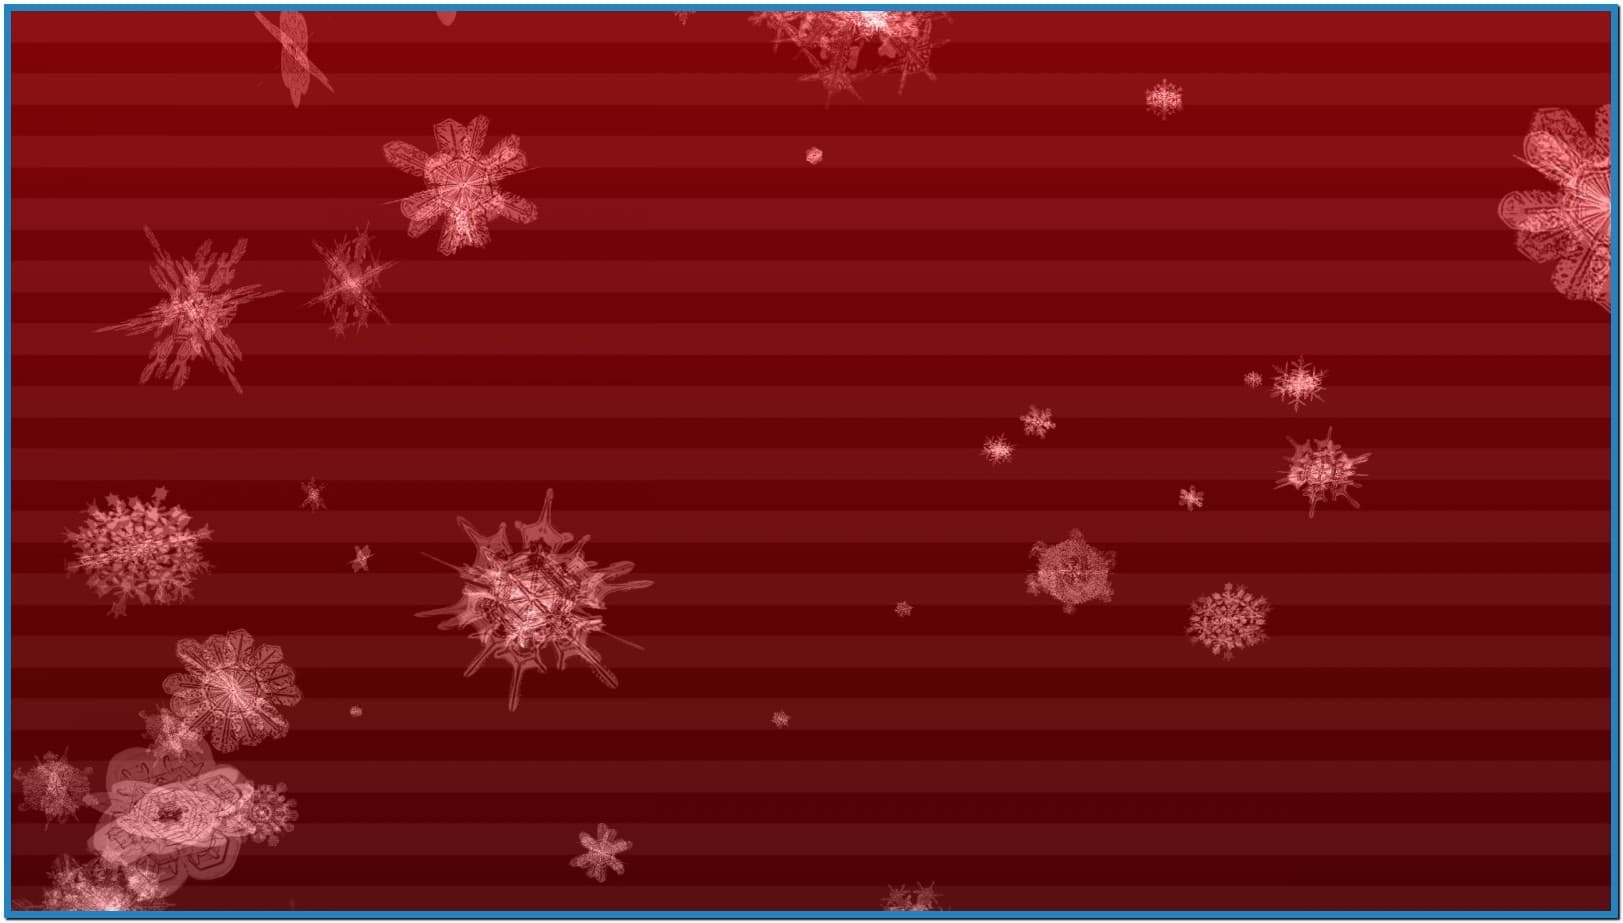 Christmas Wallpapers And Screensavers For Mac 1623x923